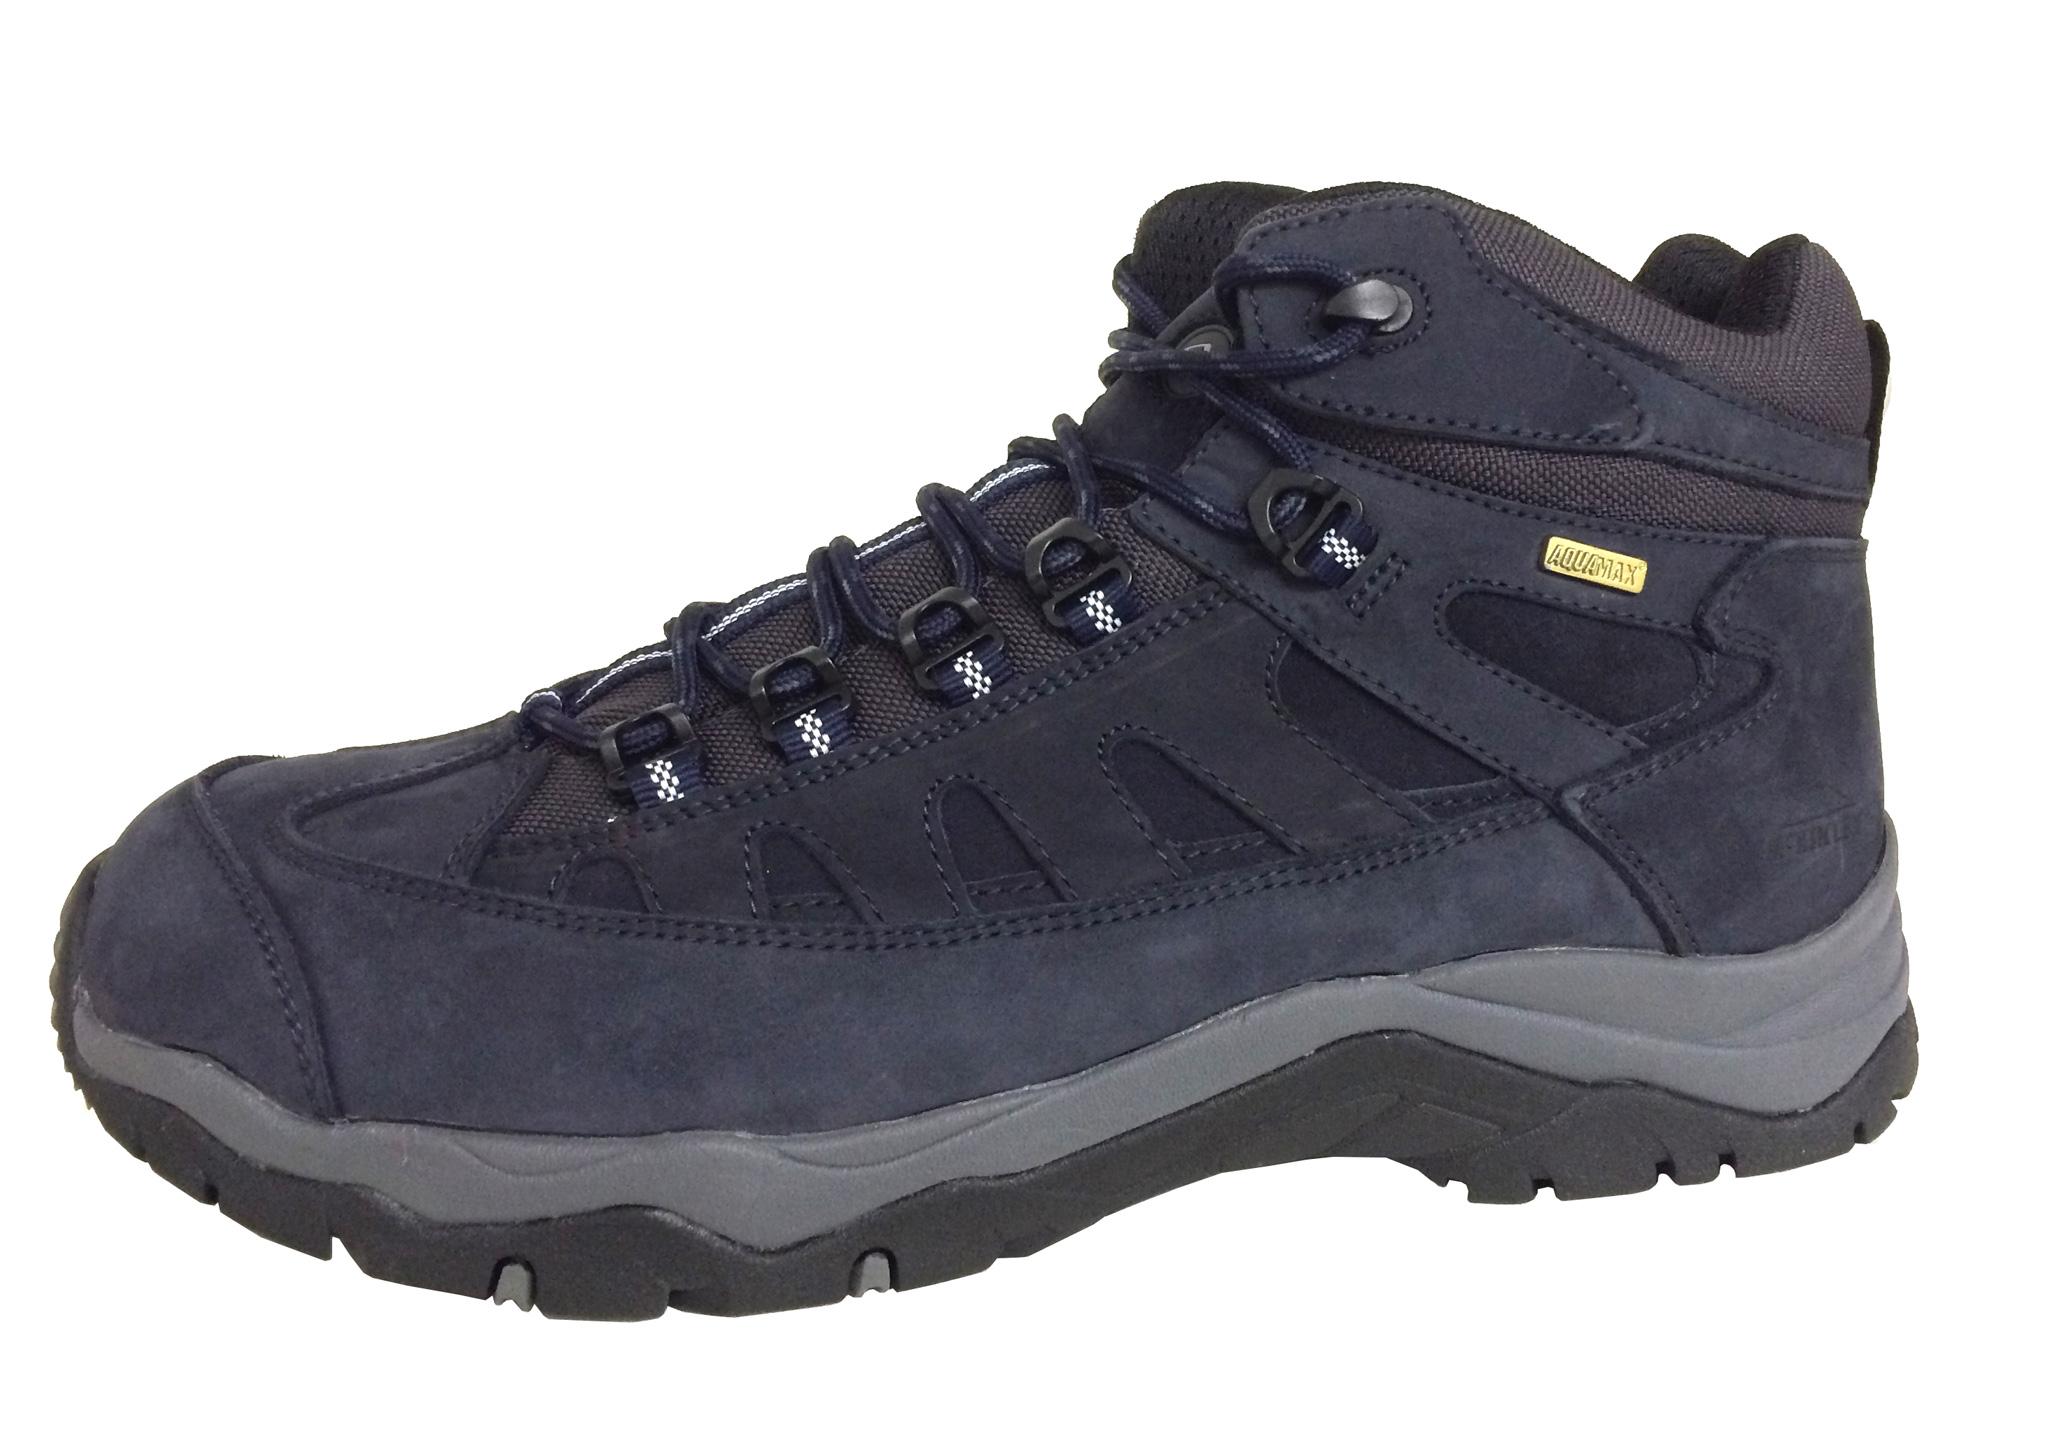 Herren Trekking-Stiefel Wabash Leather AQX